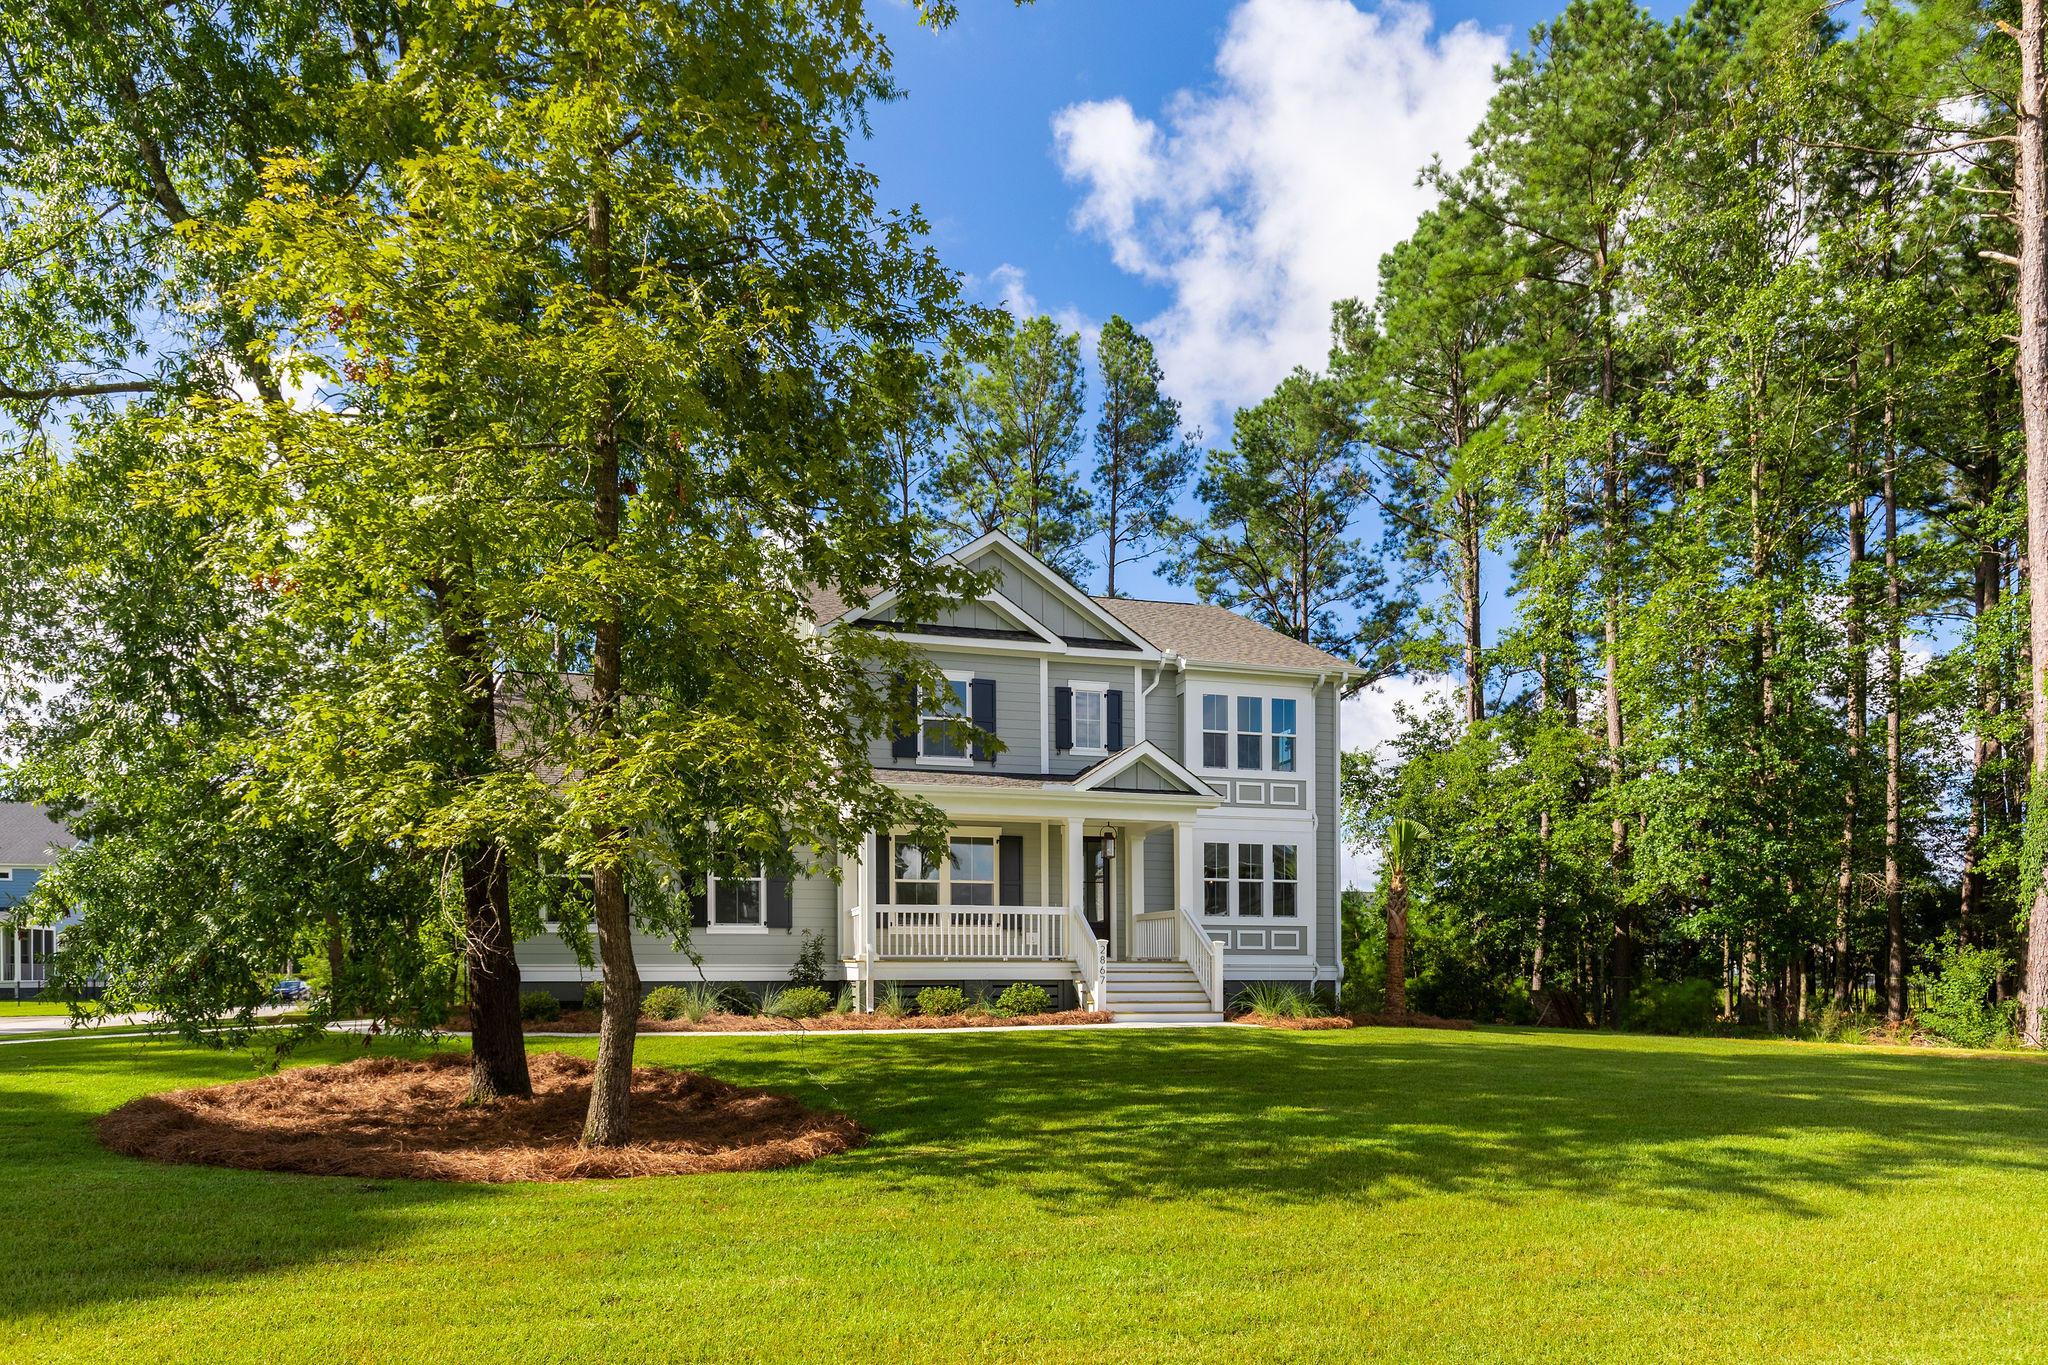 Park West Homes For Sale - 2291 Middlesex, Mount Pleasant, SC - 5